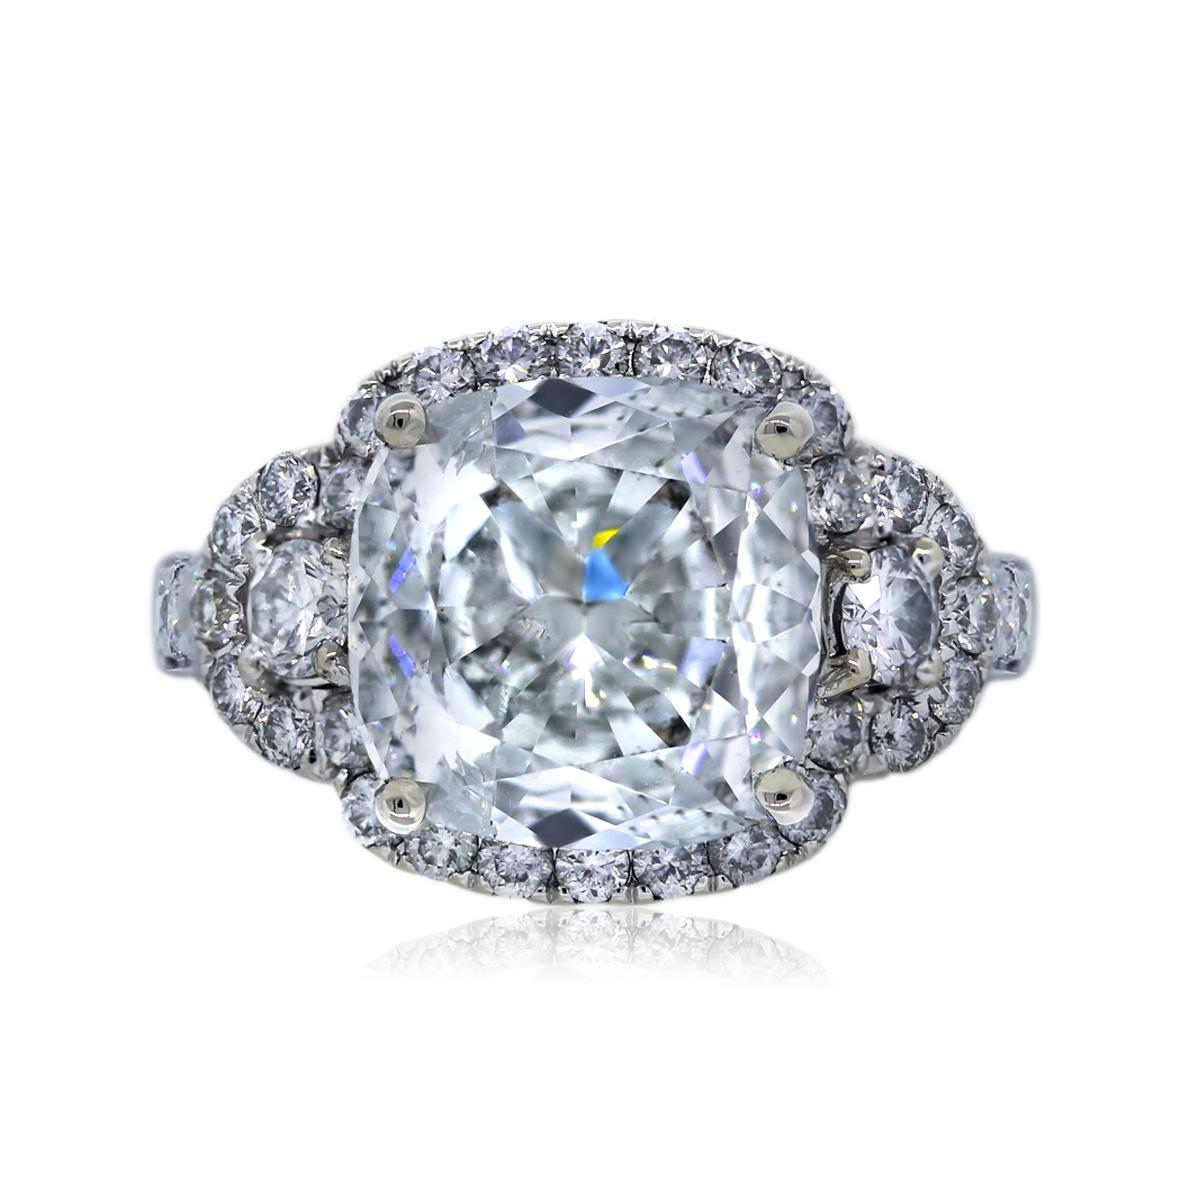 18k White Gold 357ct Cushion Cut Diamond Engagement Ring